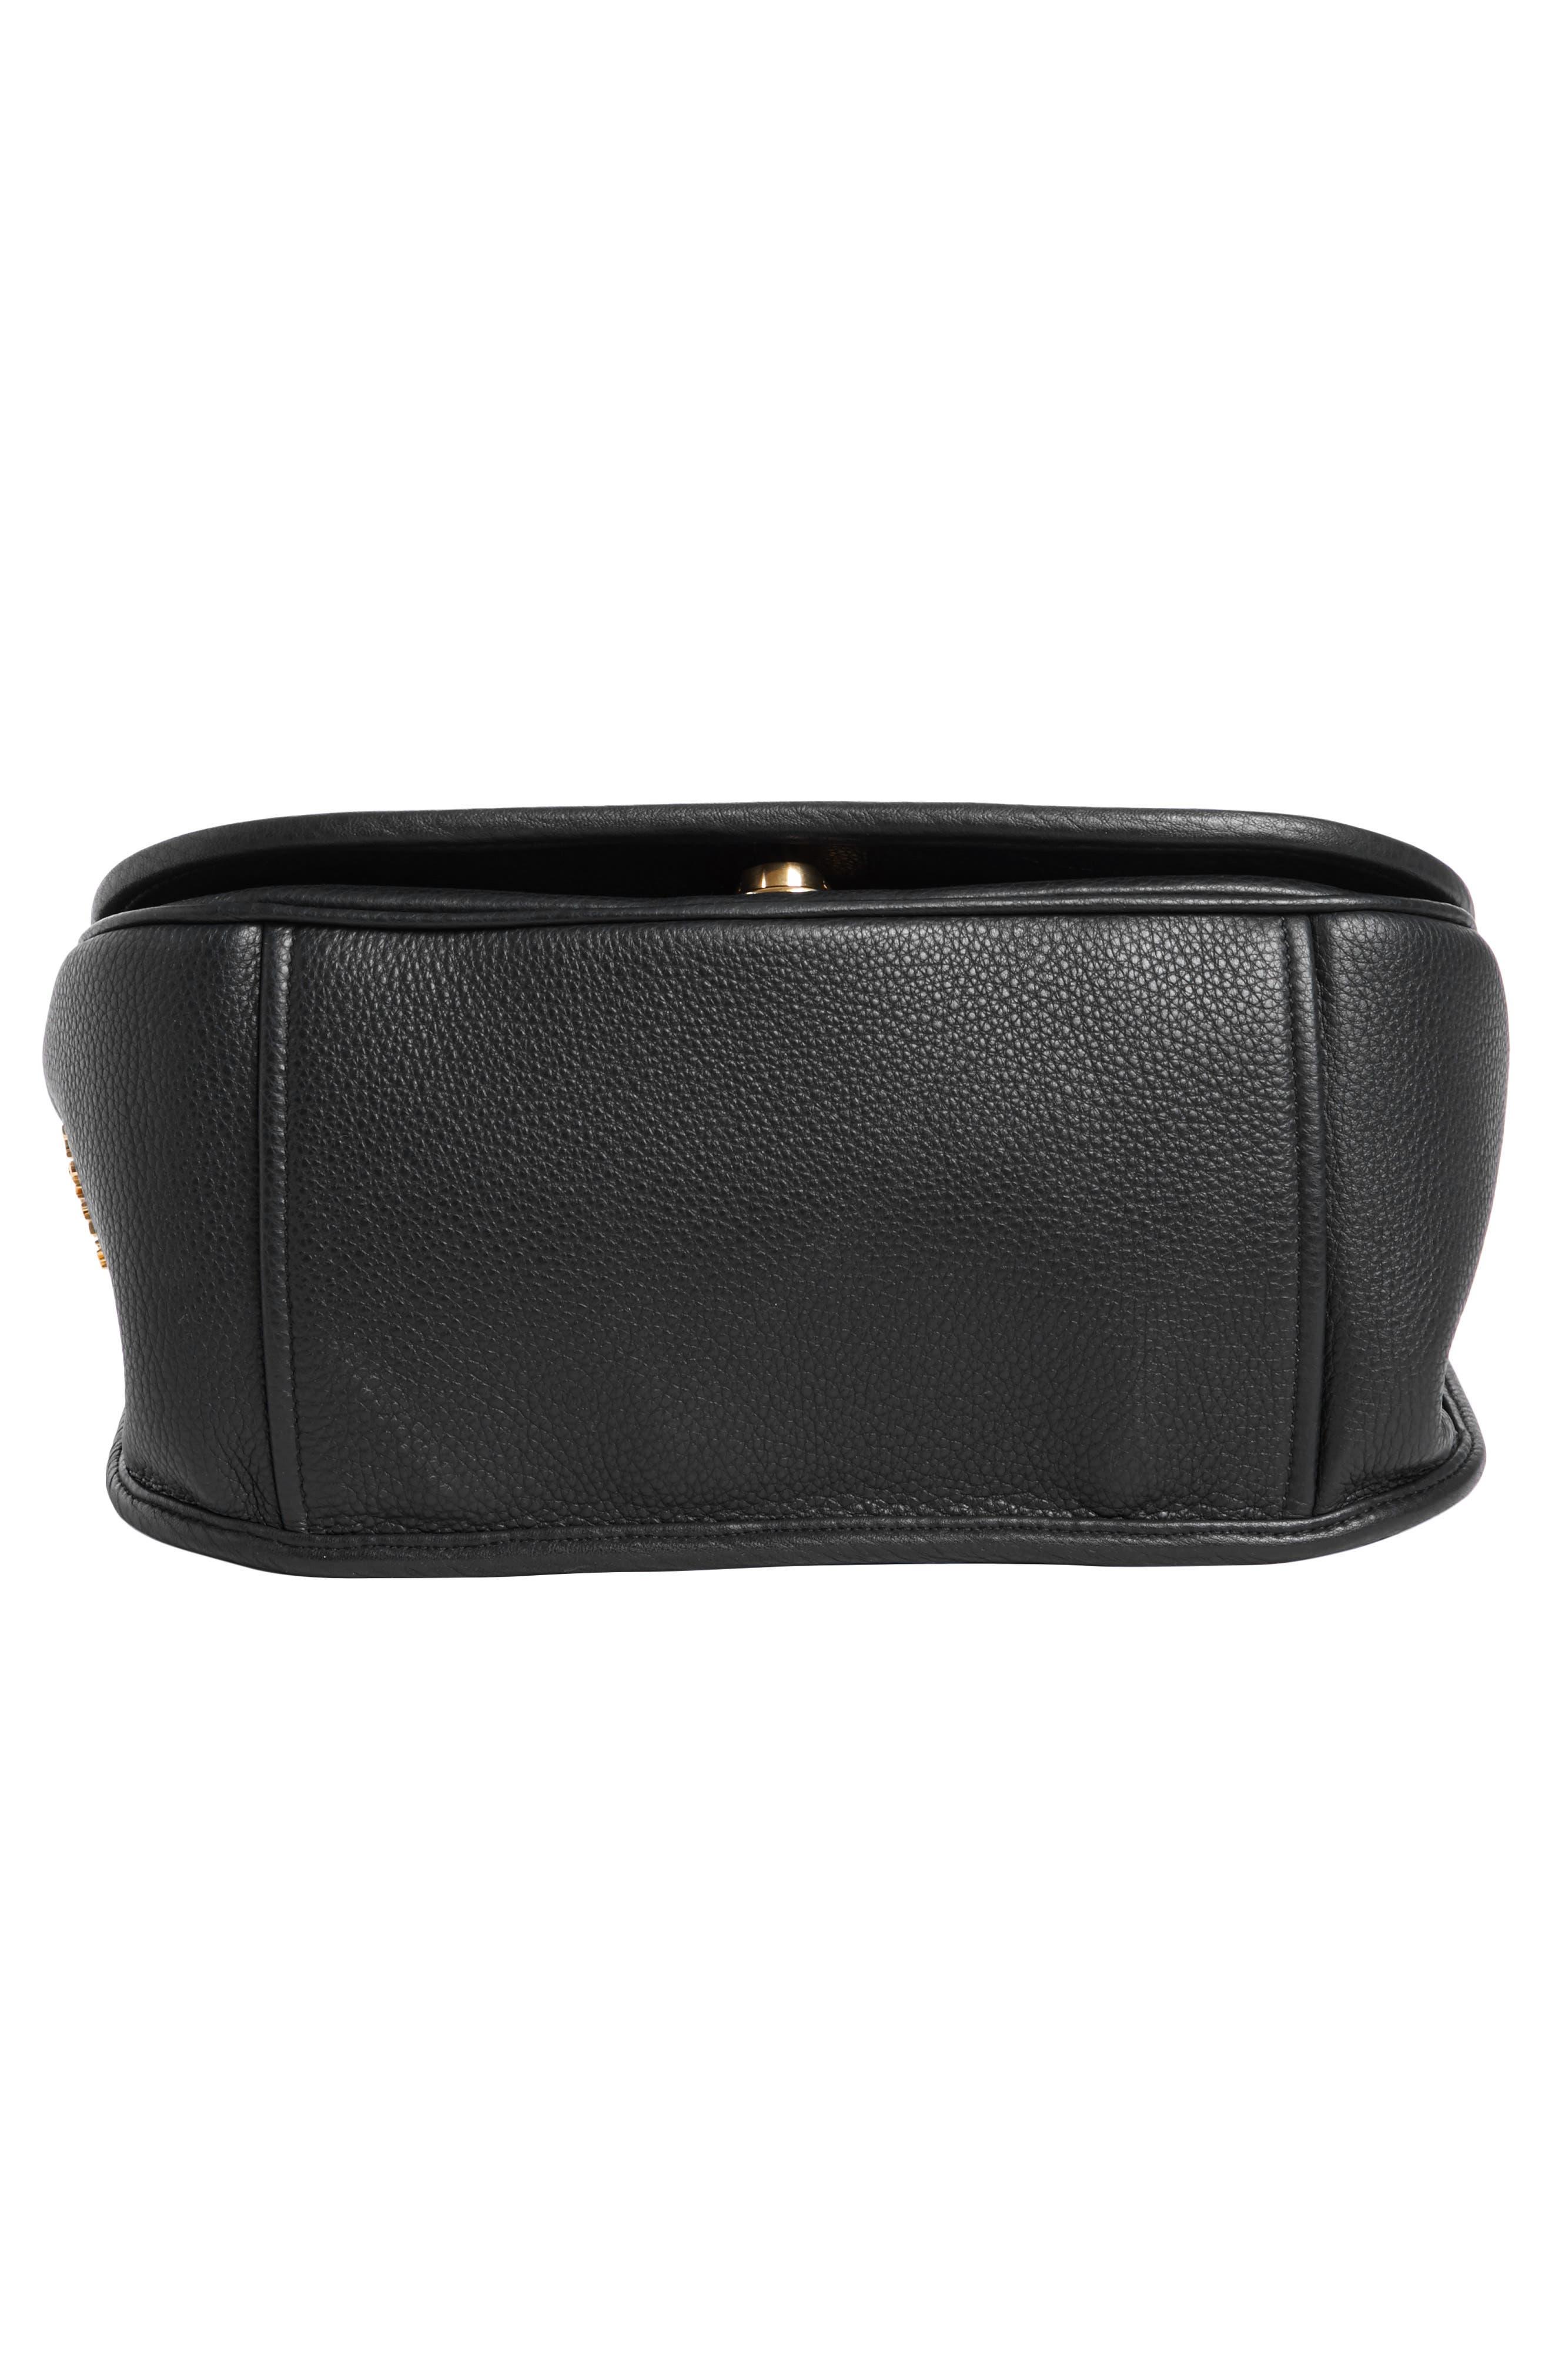 Vitello Daino Heritage Logo Leather Crossbody Bag,                             Alternate thumbnail 8, color,                             001